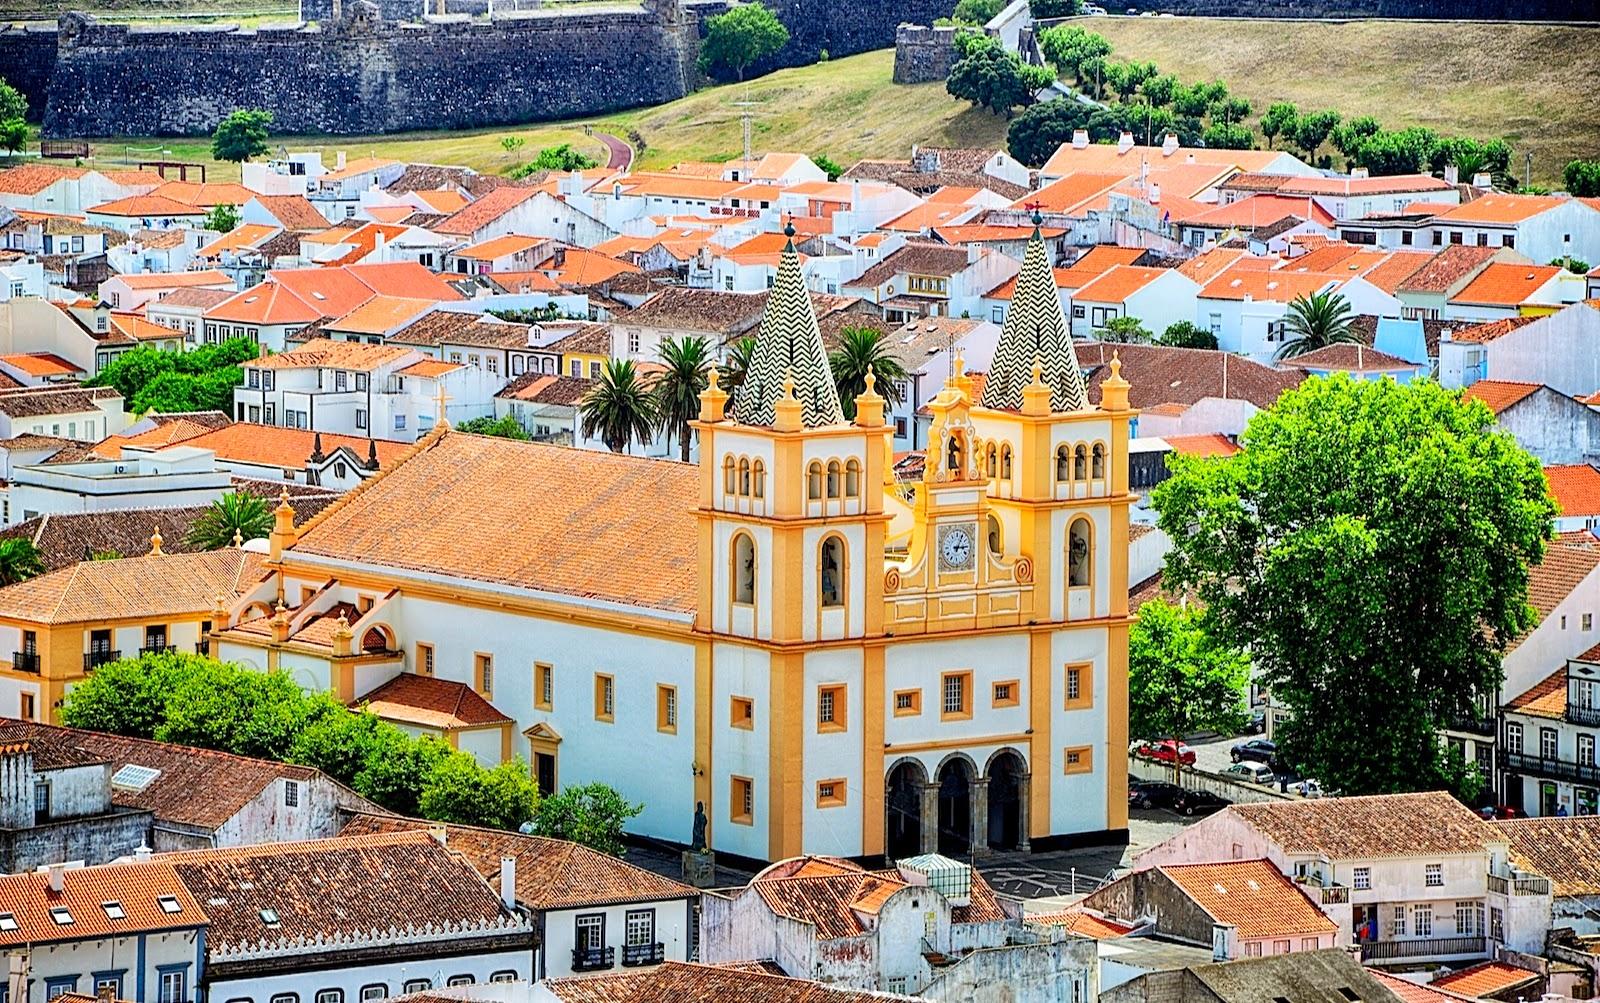 Sé Cathedral of Angra do Heroísmo, Terceira Island, Azores, Portugal